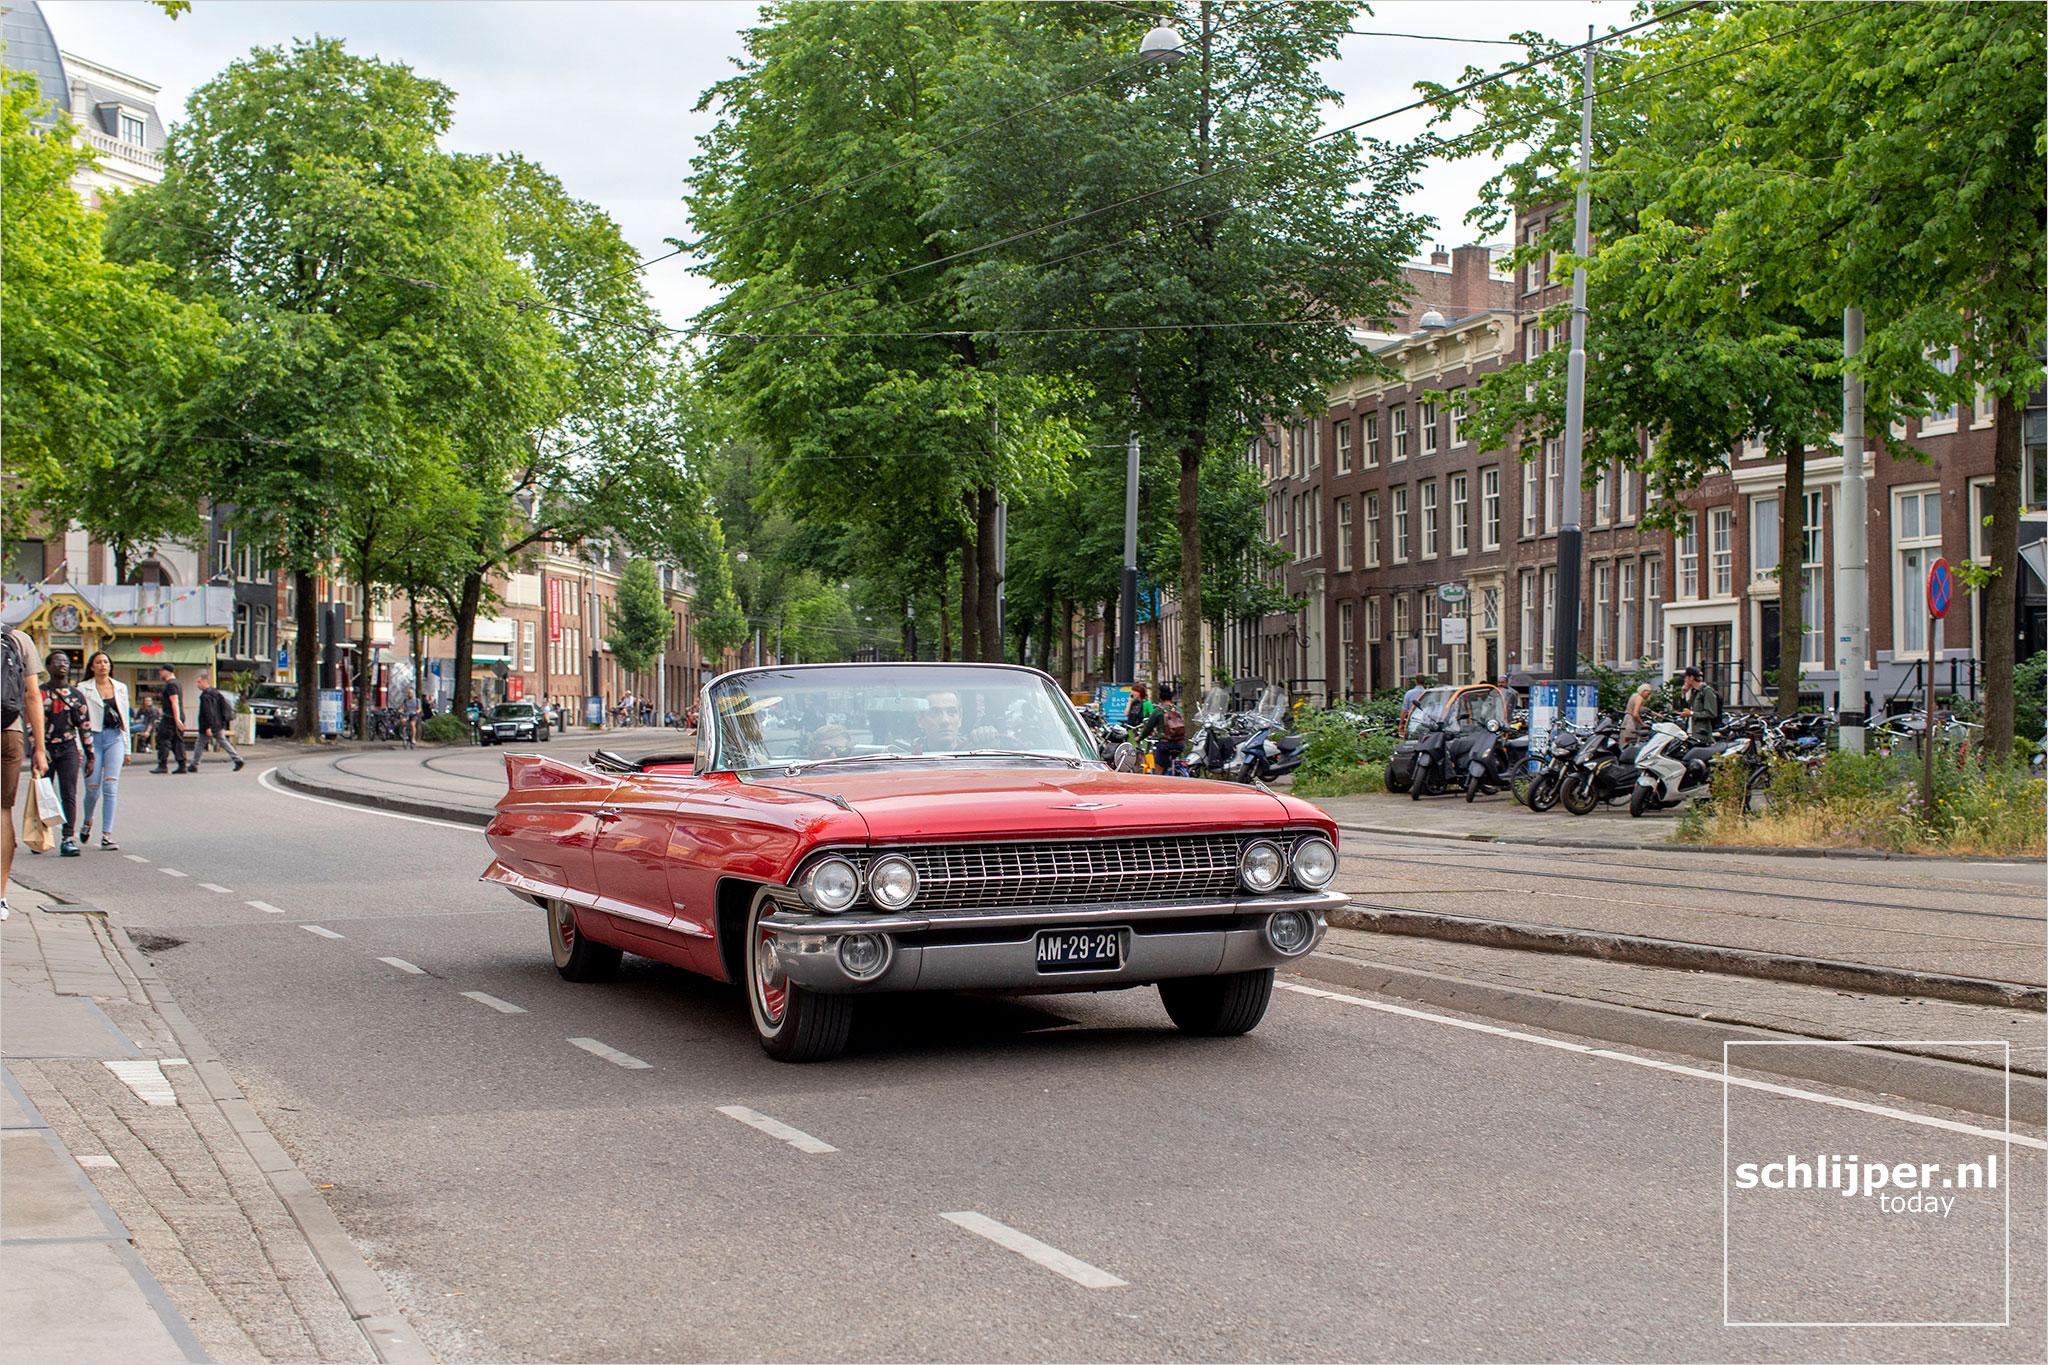 Nederland, Amsterdam, 1 juni 2020